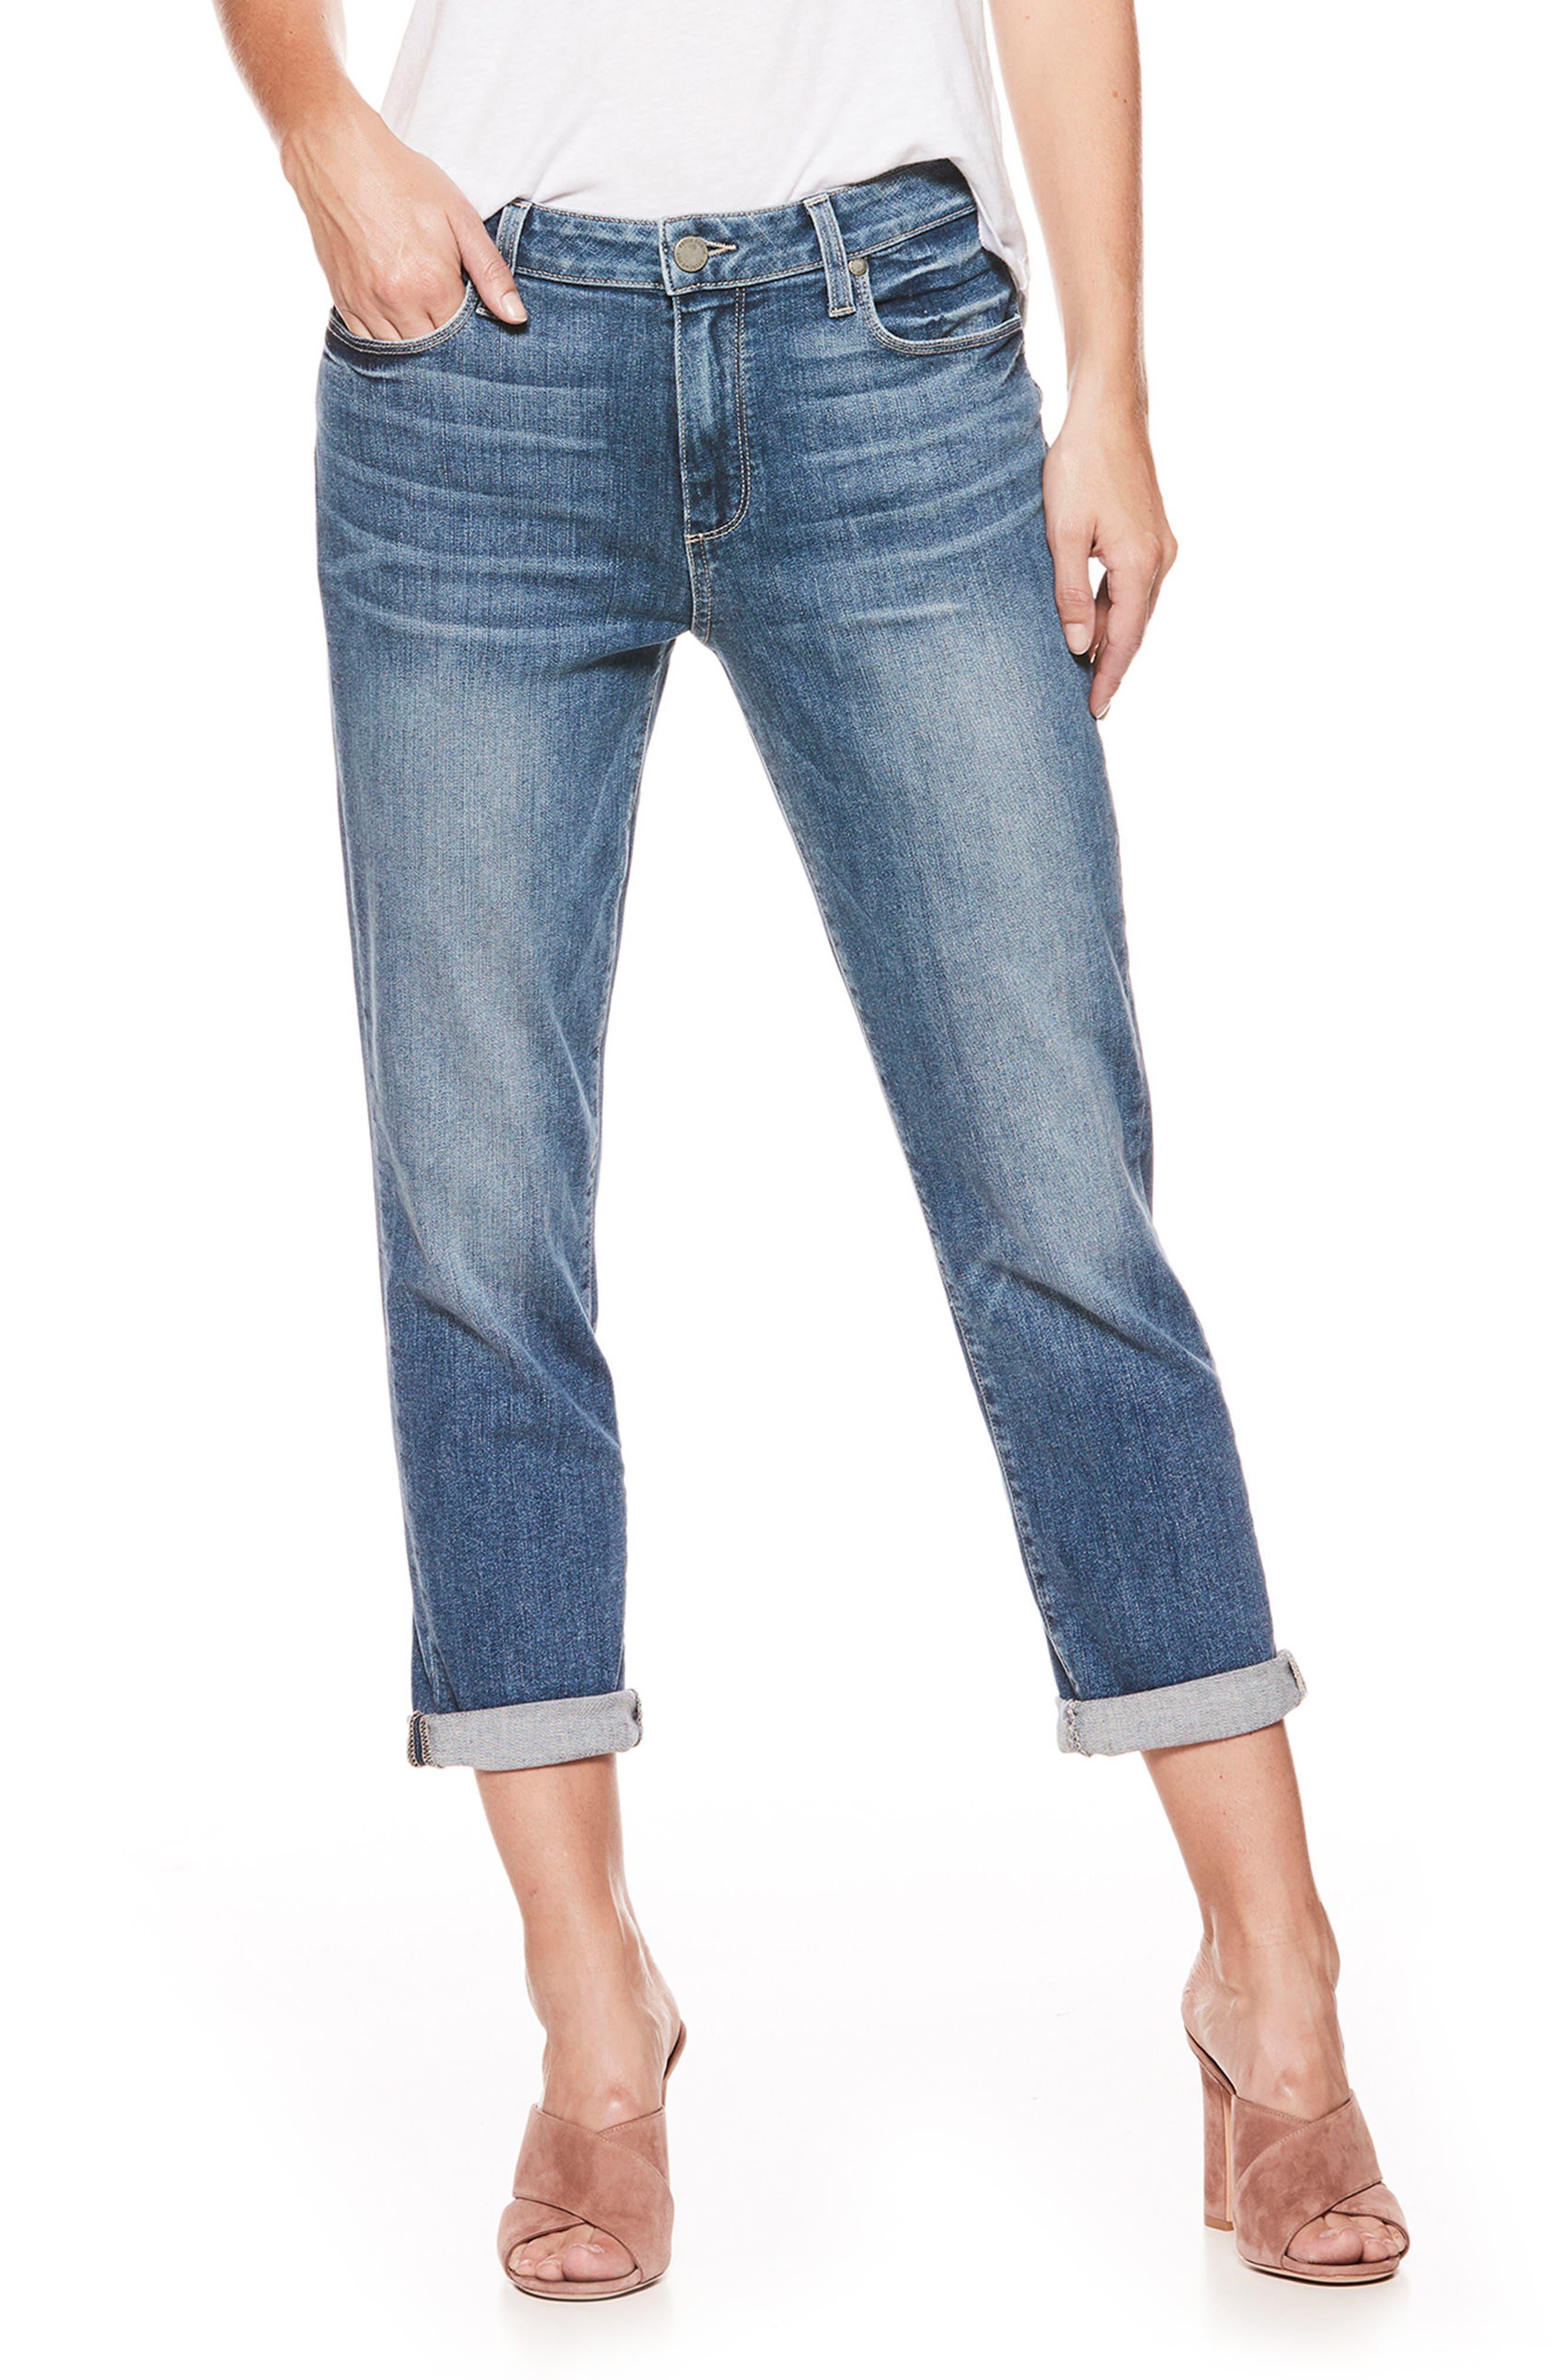 Alternate Image 1 Selected - PAIGE Jimmy Jimmy High Waist Crop Boyfriend Jeans (Kanan)